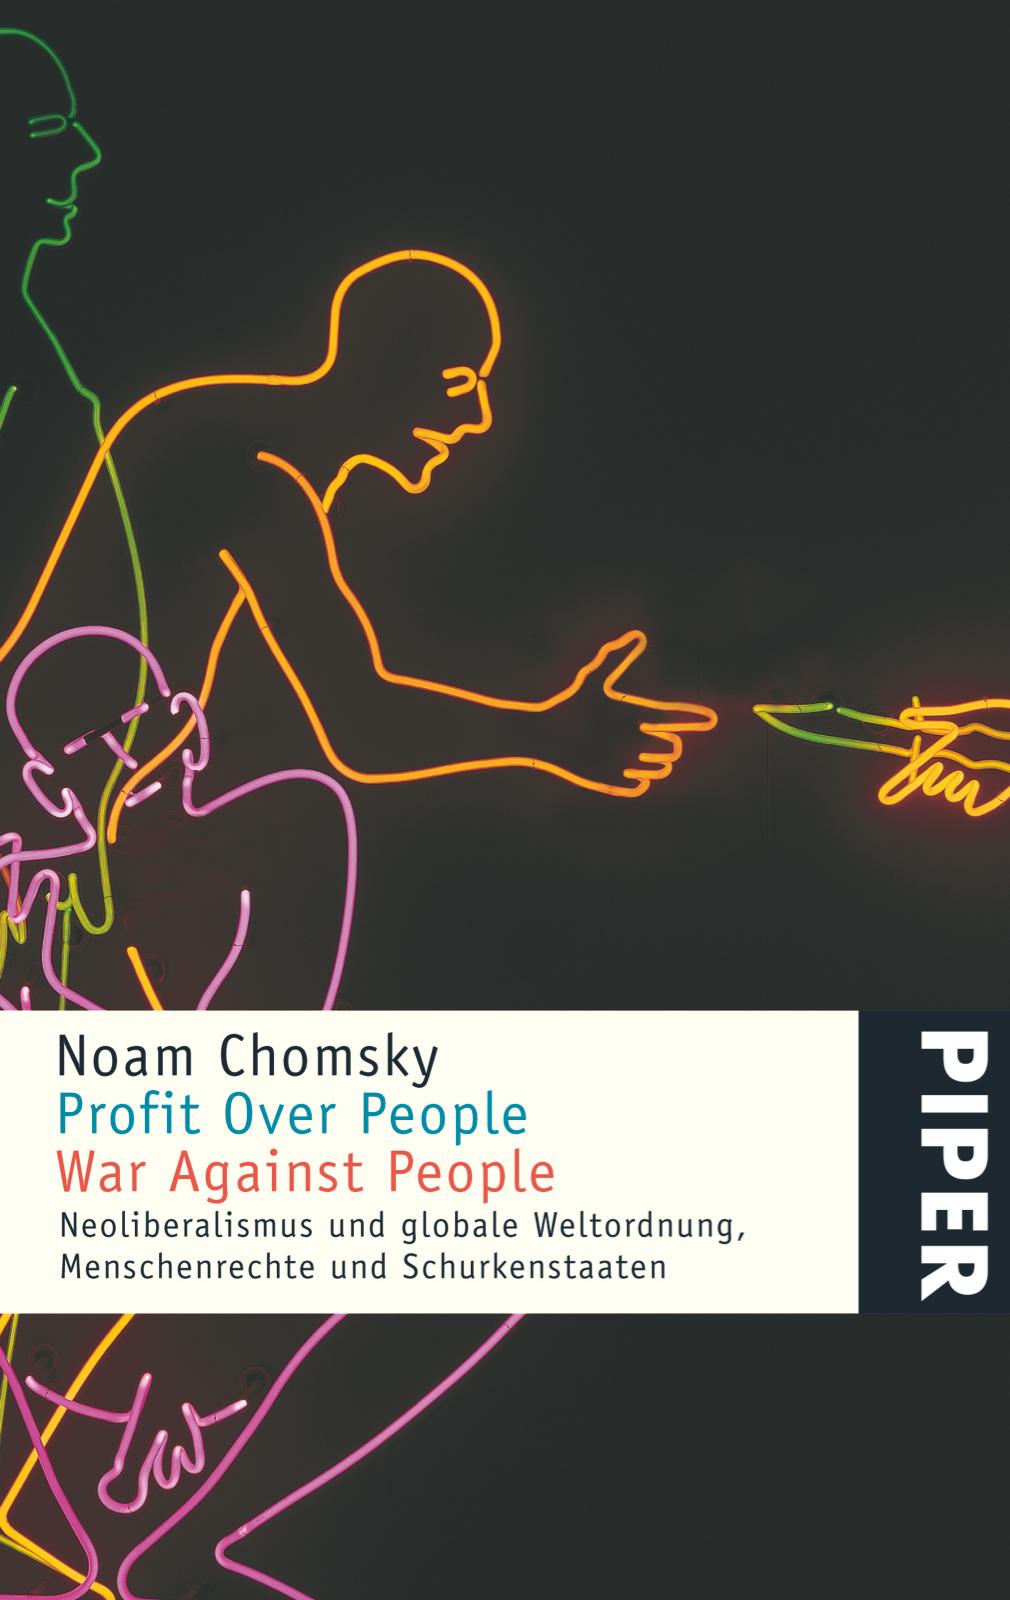 Profit Over People War Against People: Neoliberalismus und globale Weltordnung, Menschenrechte und Schurkenstaaten - Noa